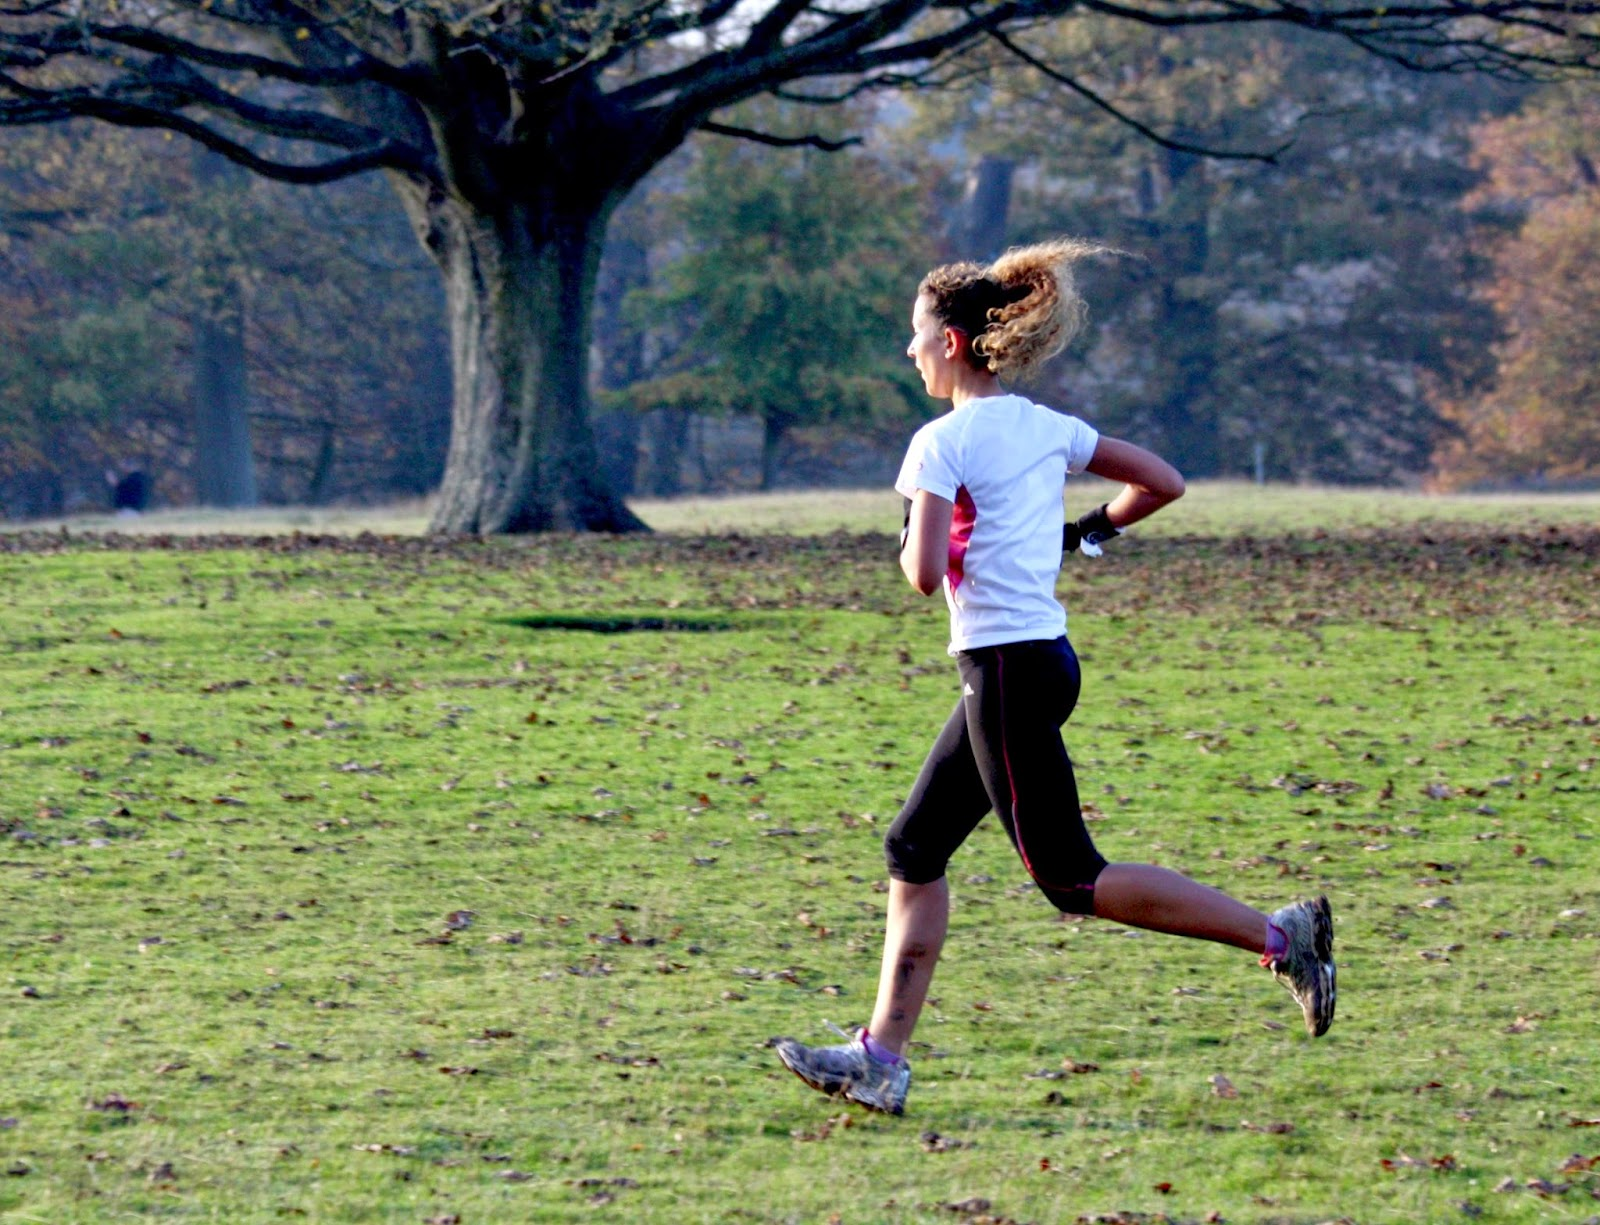 Que comer despues de correr para no perder masa muscular al adelgazar